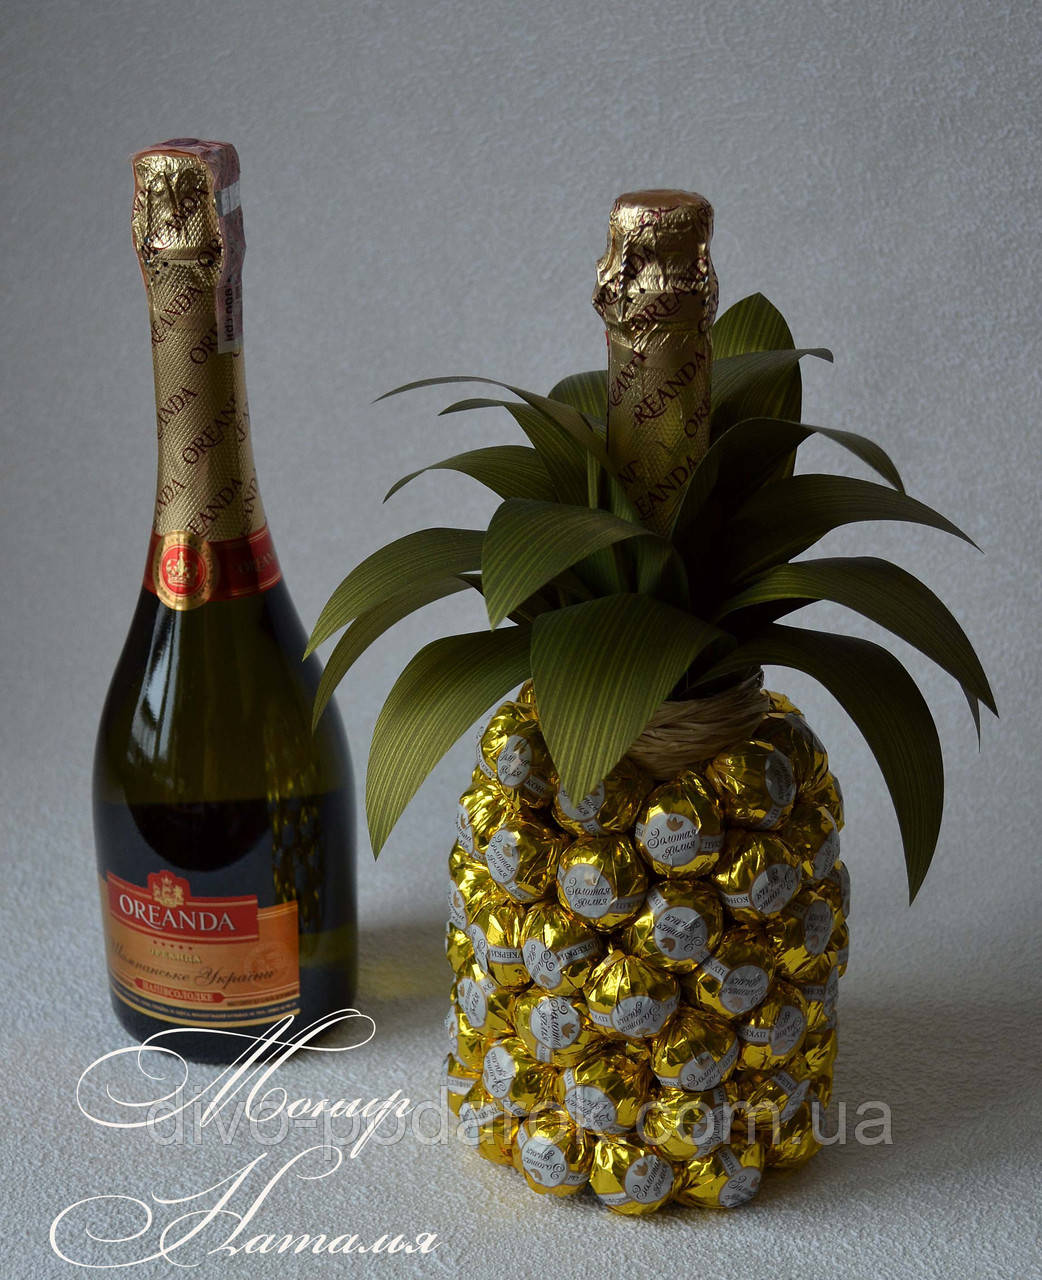 Букеты из конфет, декор бутылок вина и шампанского Olga Malinovskaya